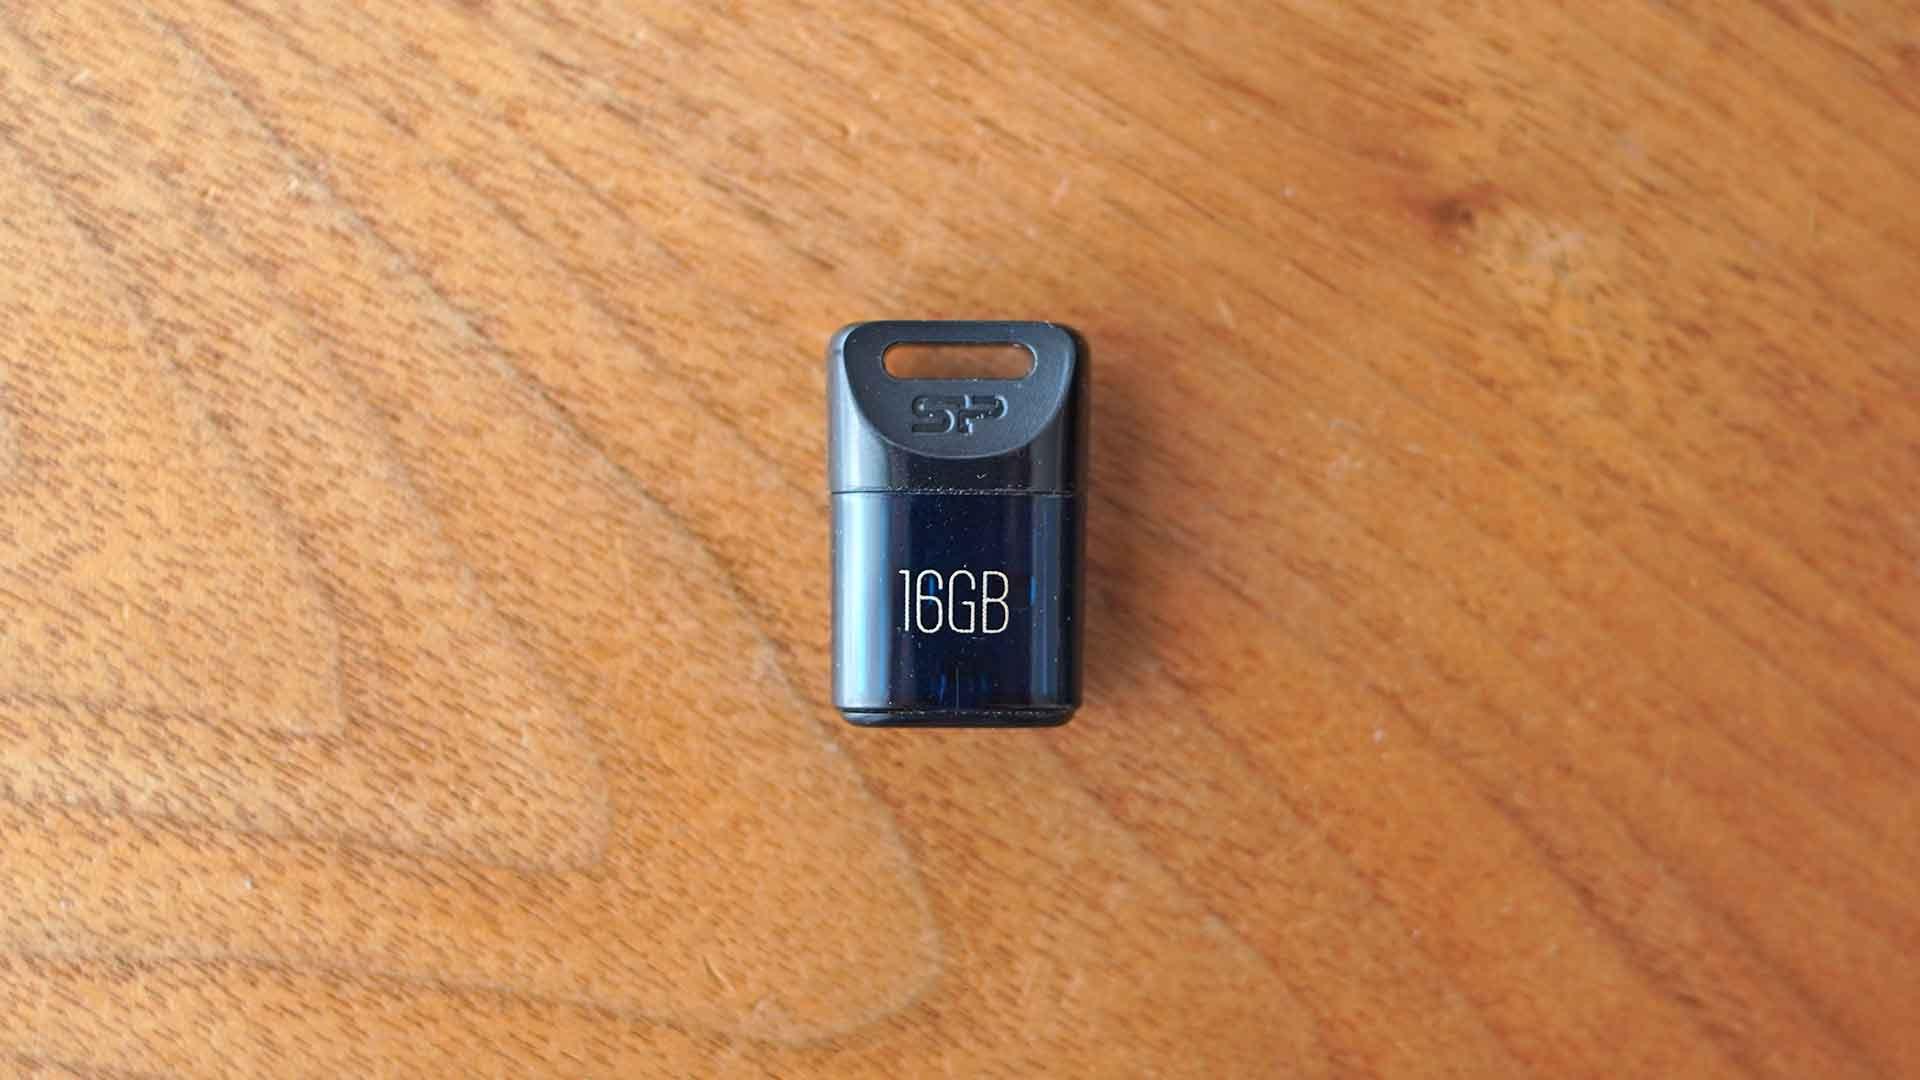 USBメモリー,シリコンパワー,小さい,コンパクト,軽い,安い,お洒落